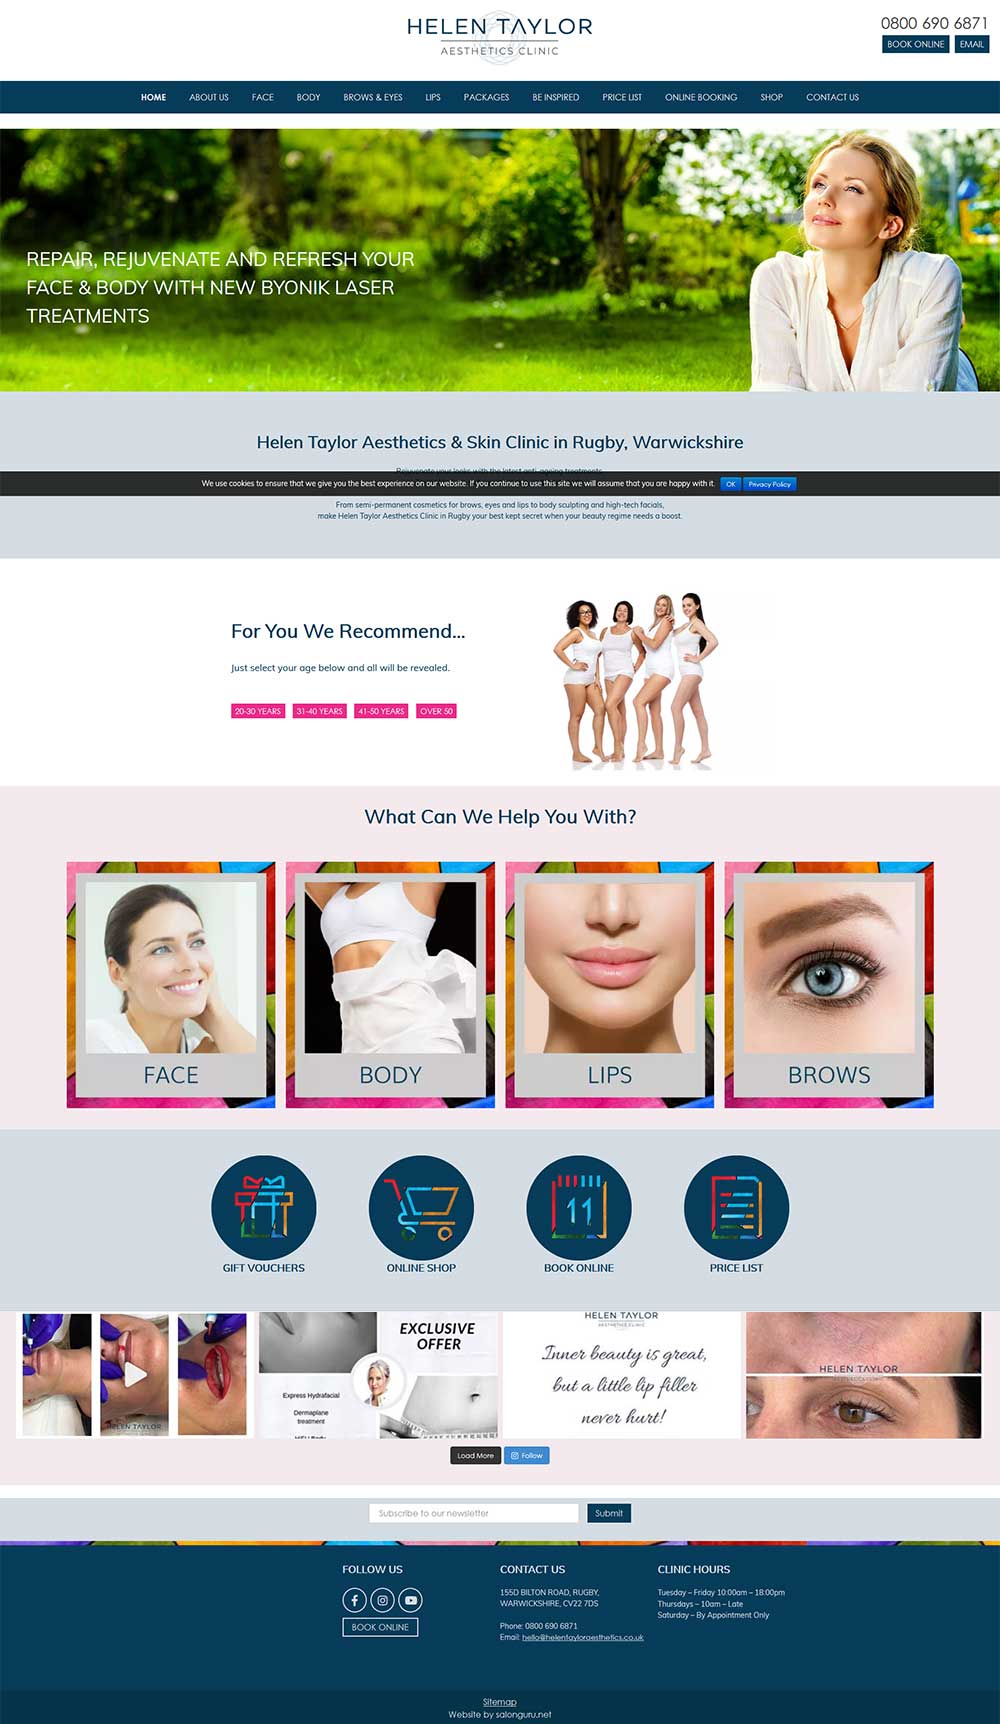 Helen Taylor Aesthetics website